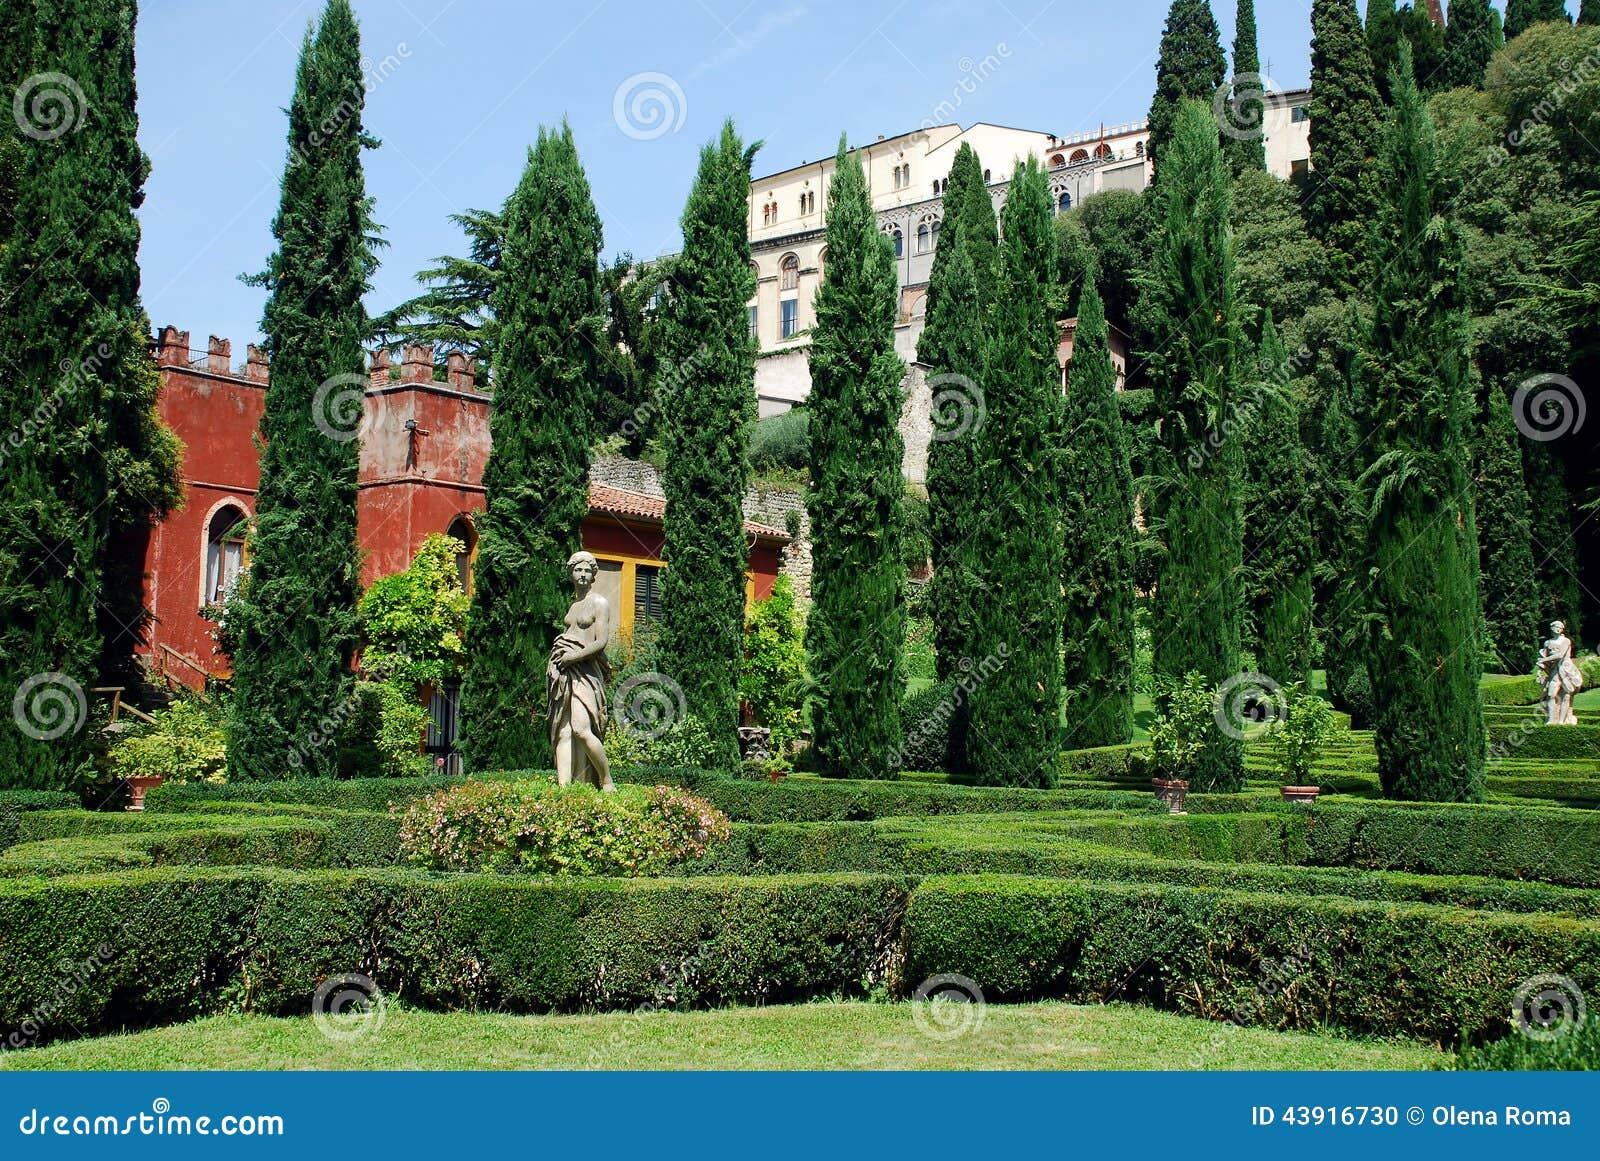 Garden Giardino Giusti, Verona, Italy Stock Photo - Image